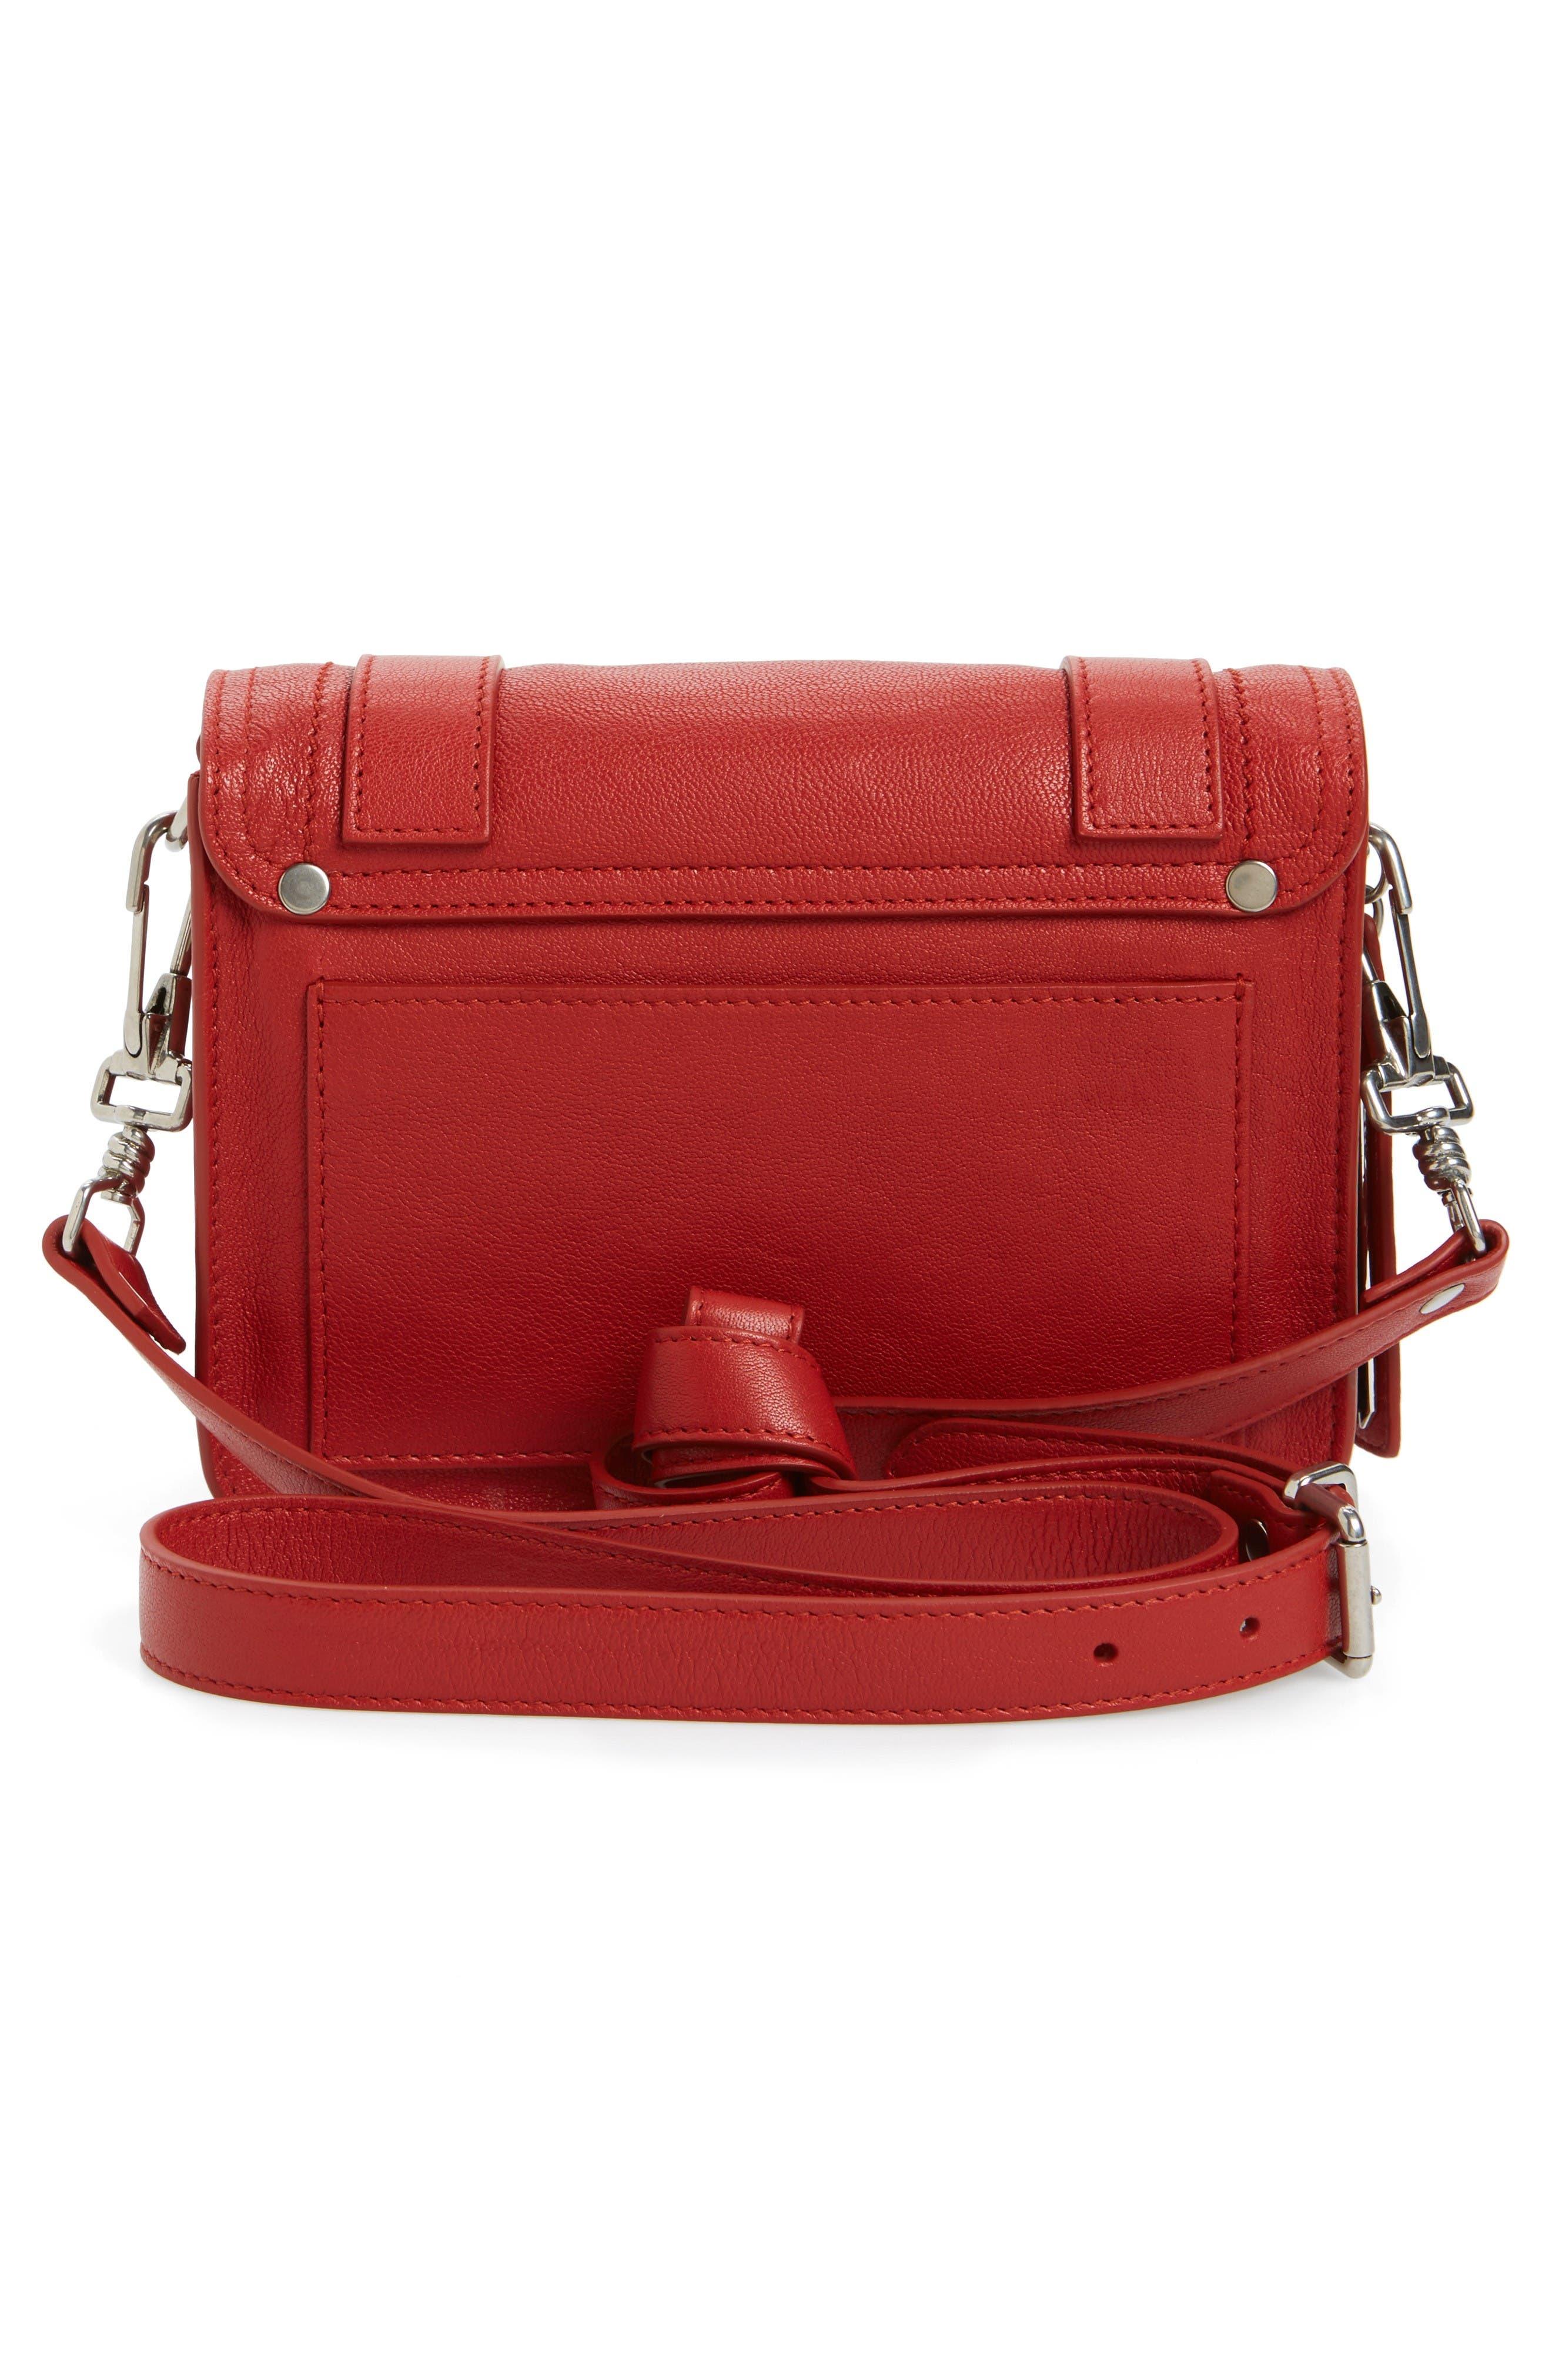 Alternate Image 2  - Proenza Schouler 'Mini PS1' Lambskin Leather Crossbody Bag